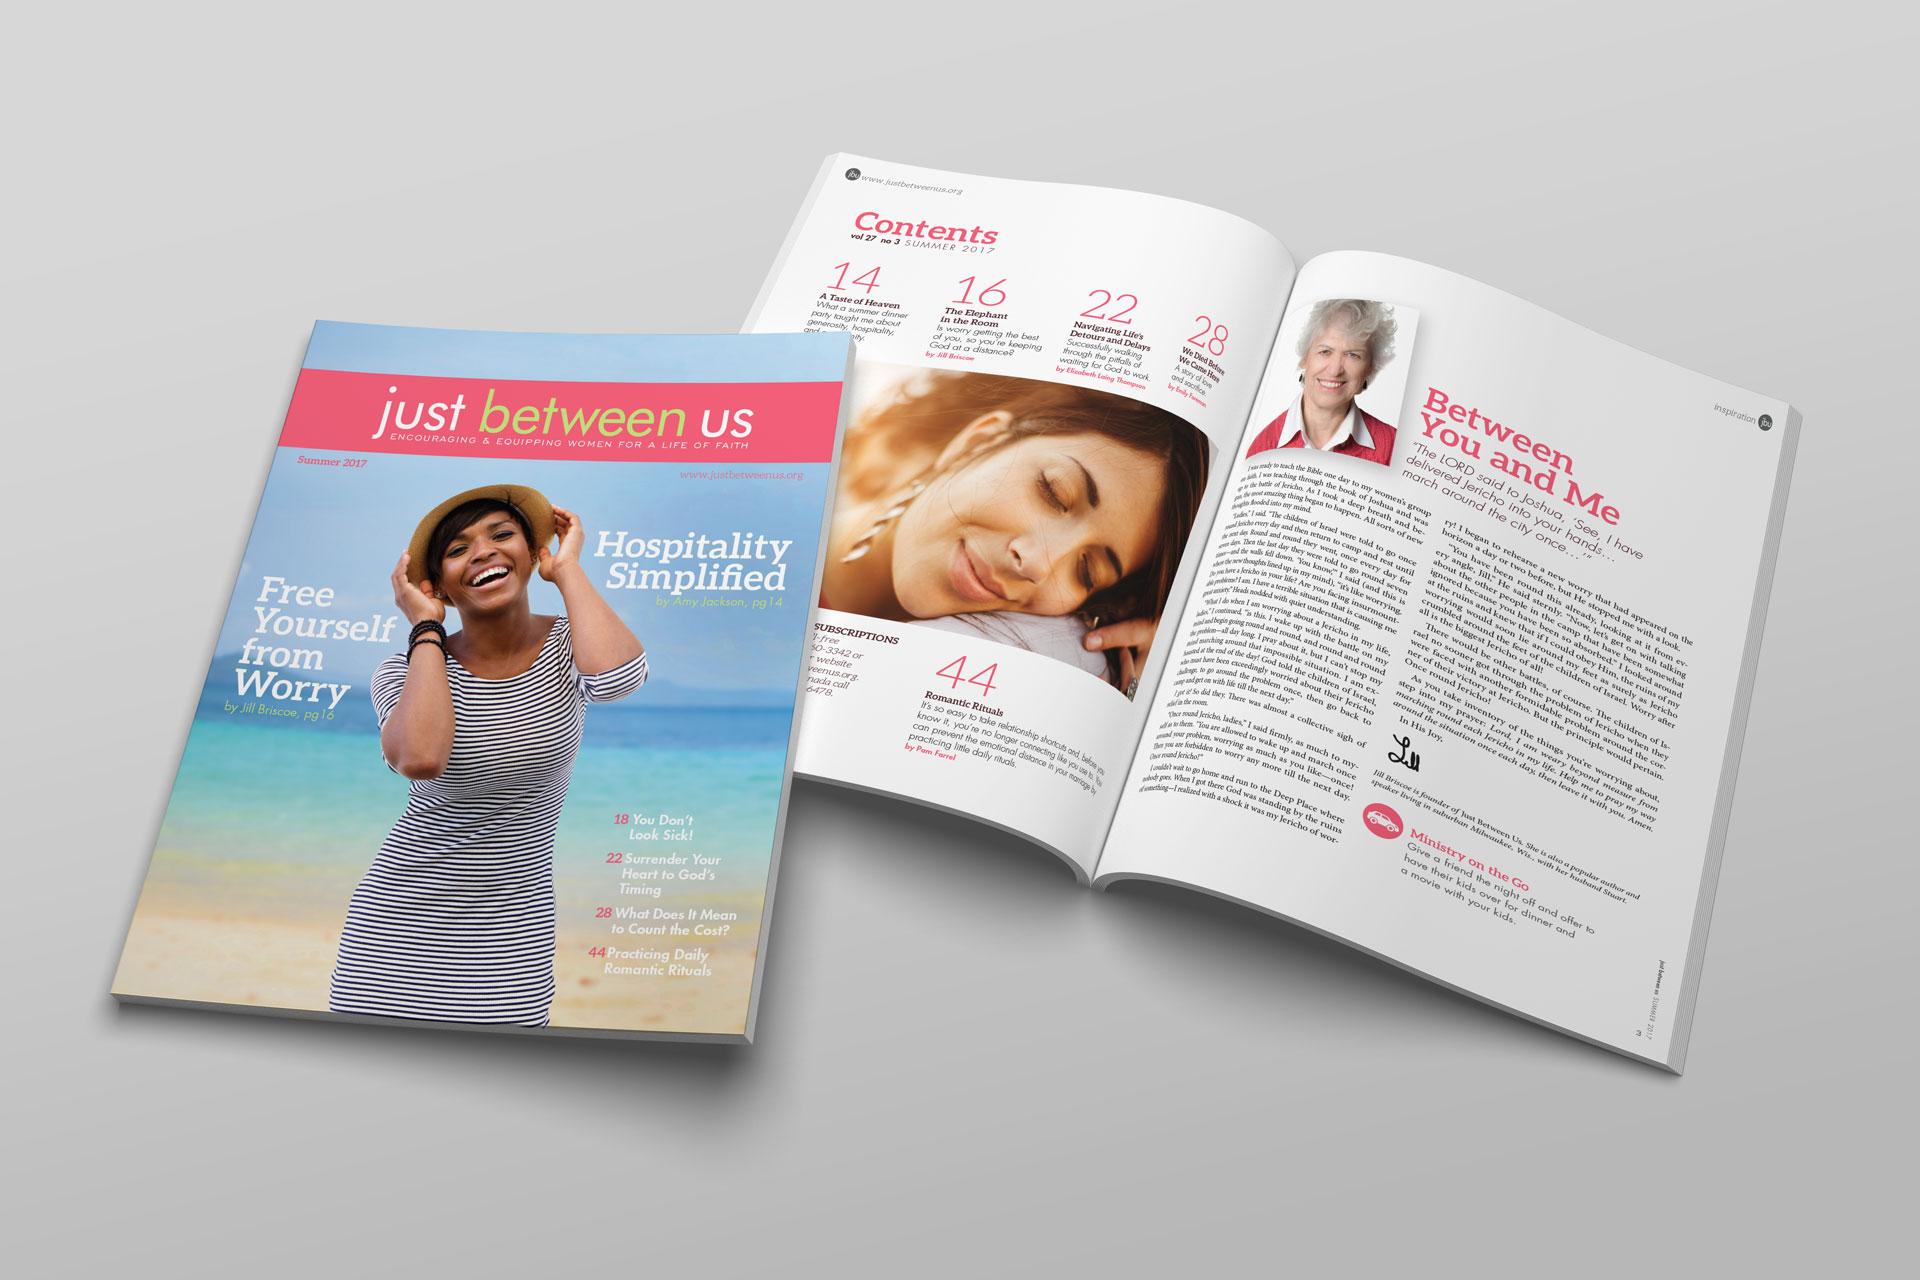 JBU-summer17-cover.jpg